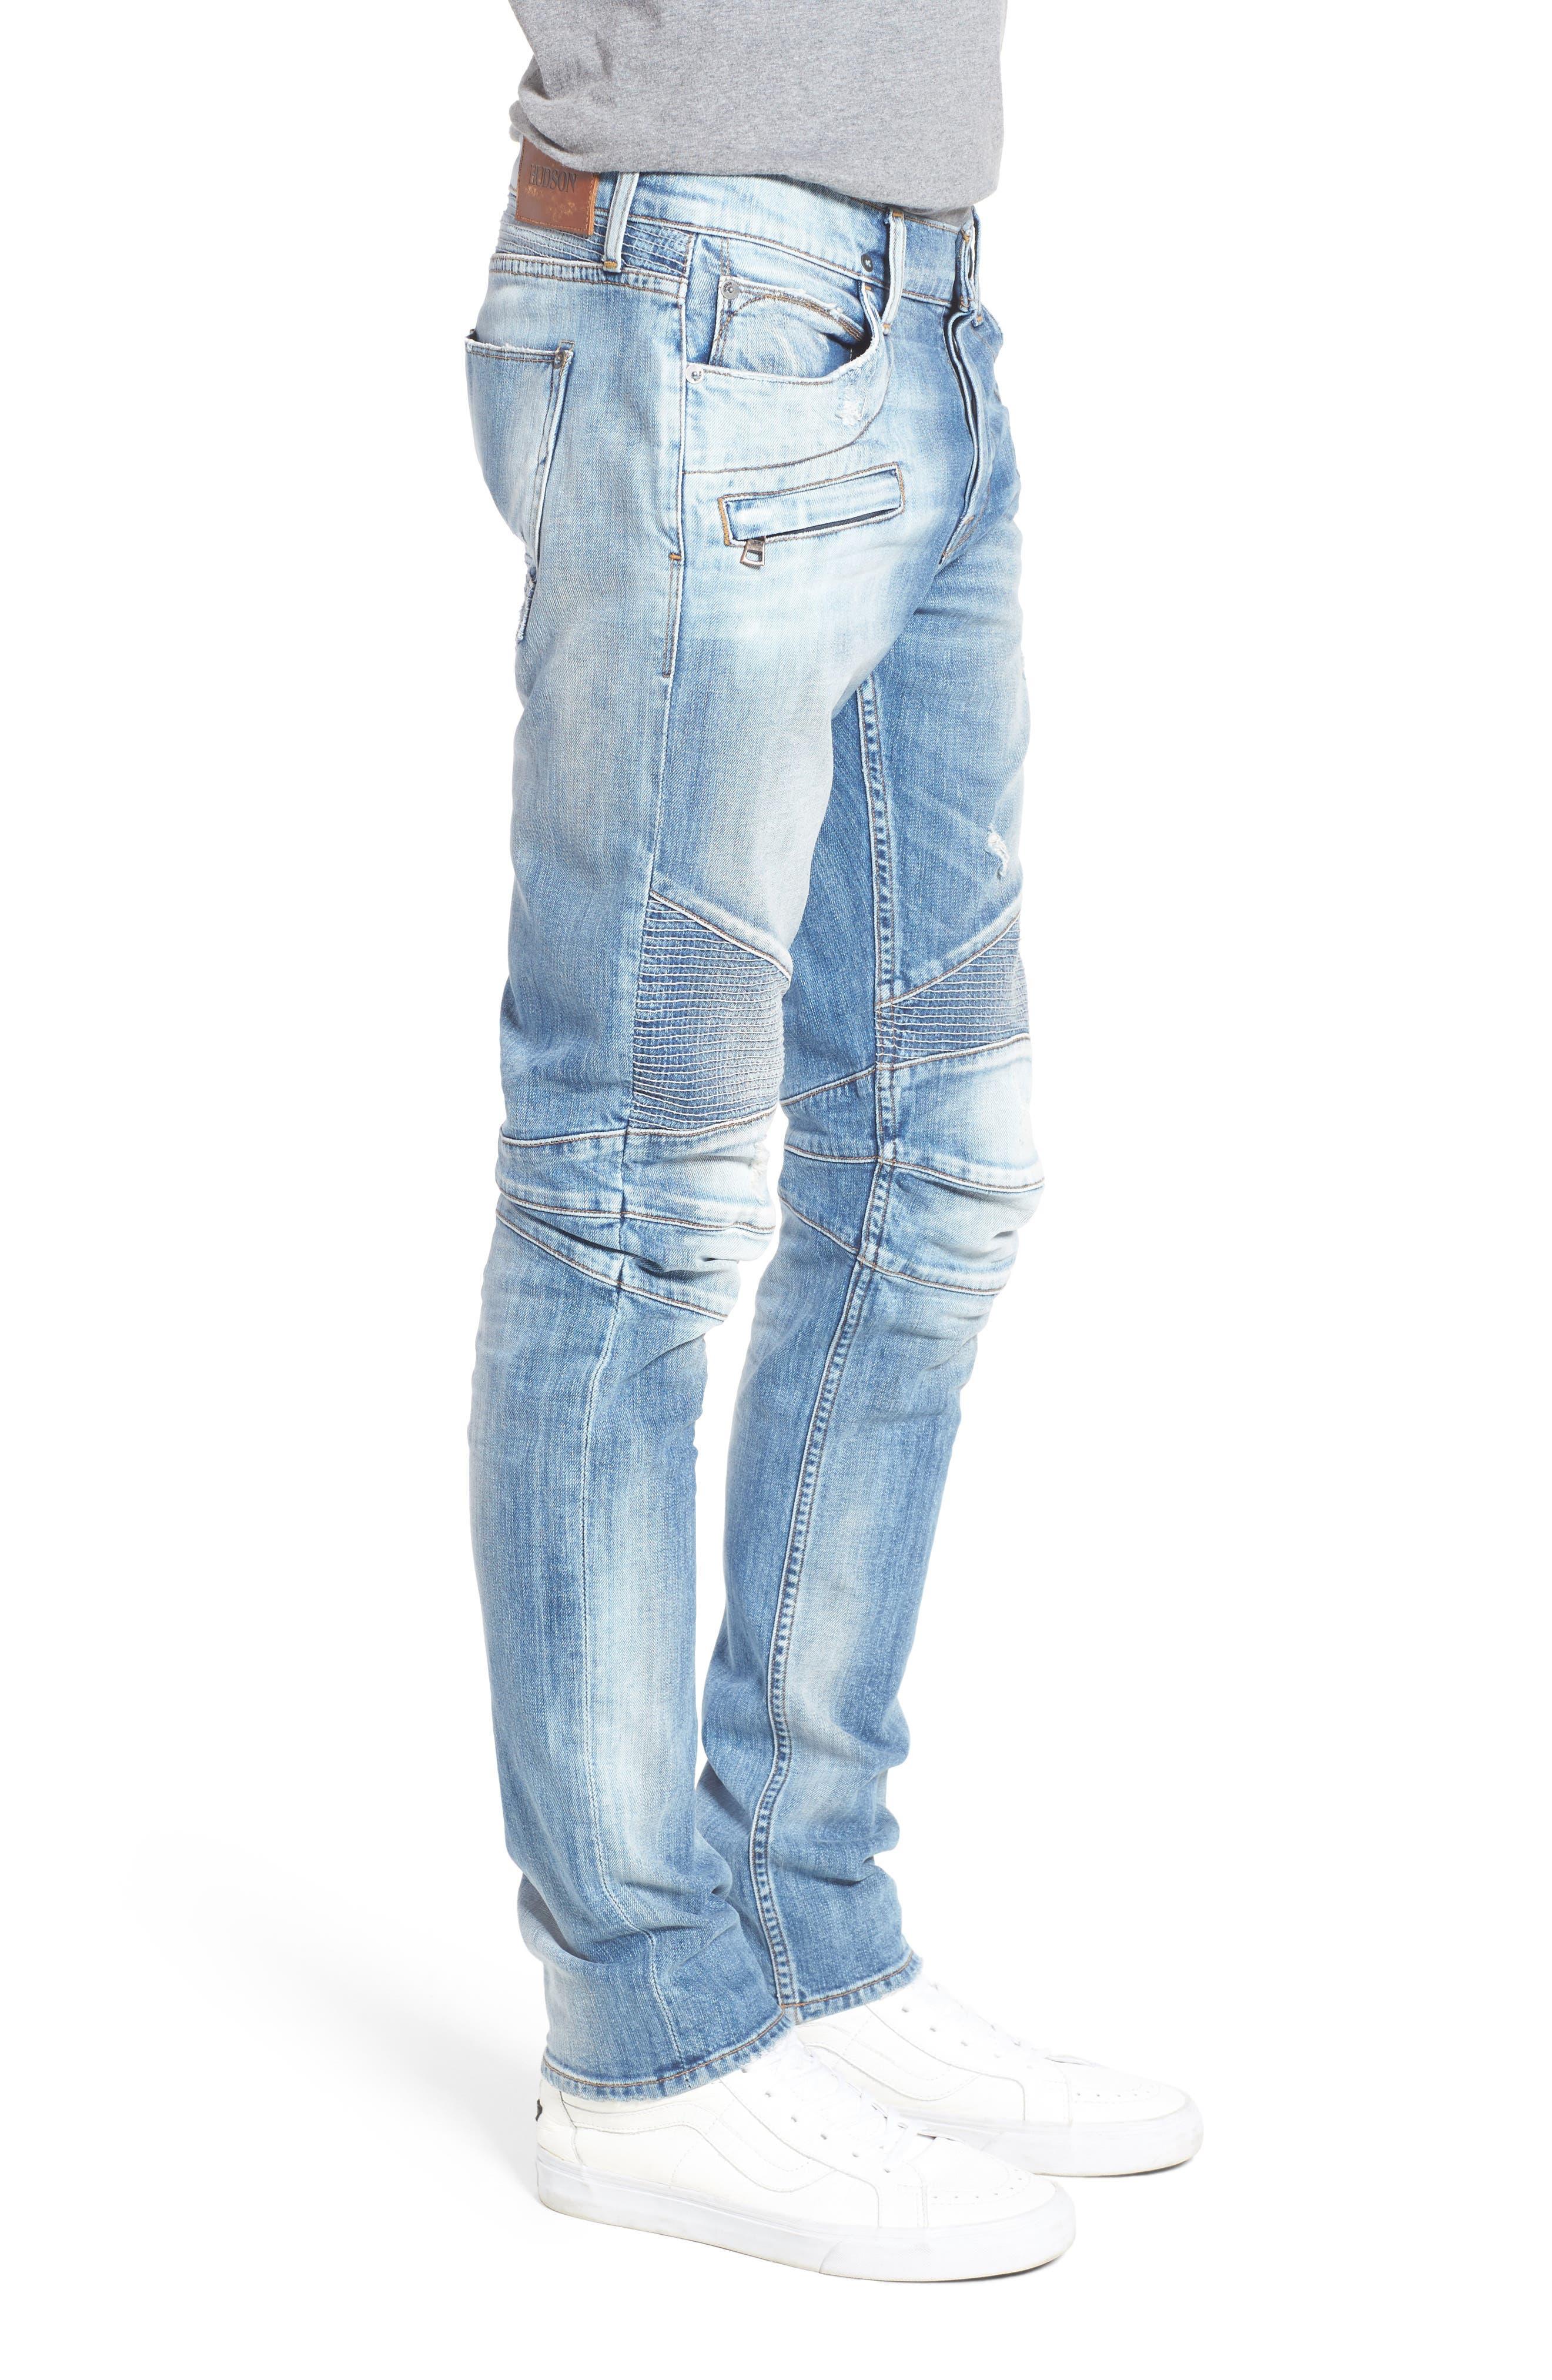 Blinder Skinny Fit Moto Jeans,                             Alternate thumbnail 3, color,                             THRASH